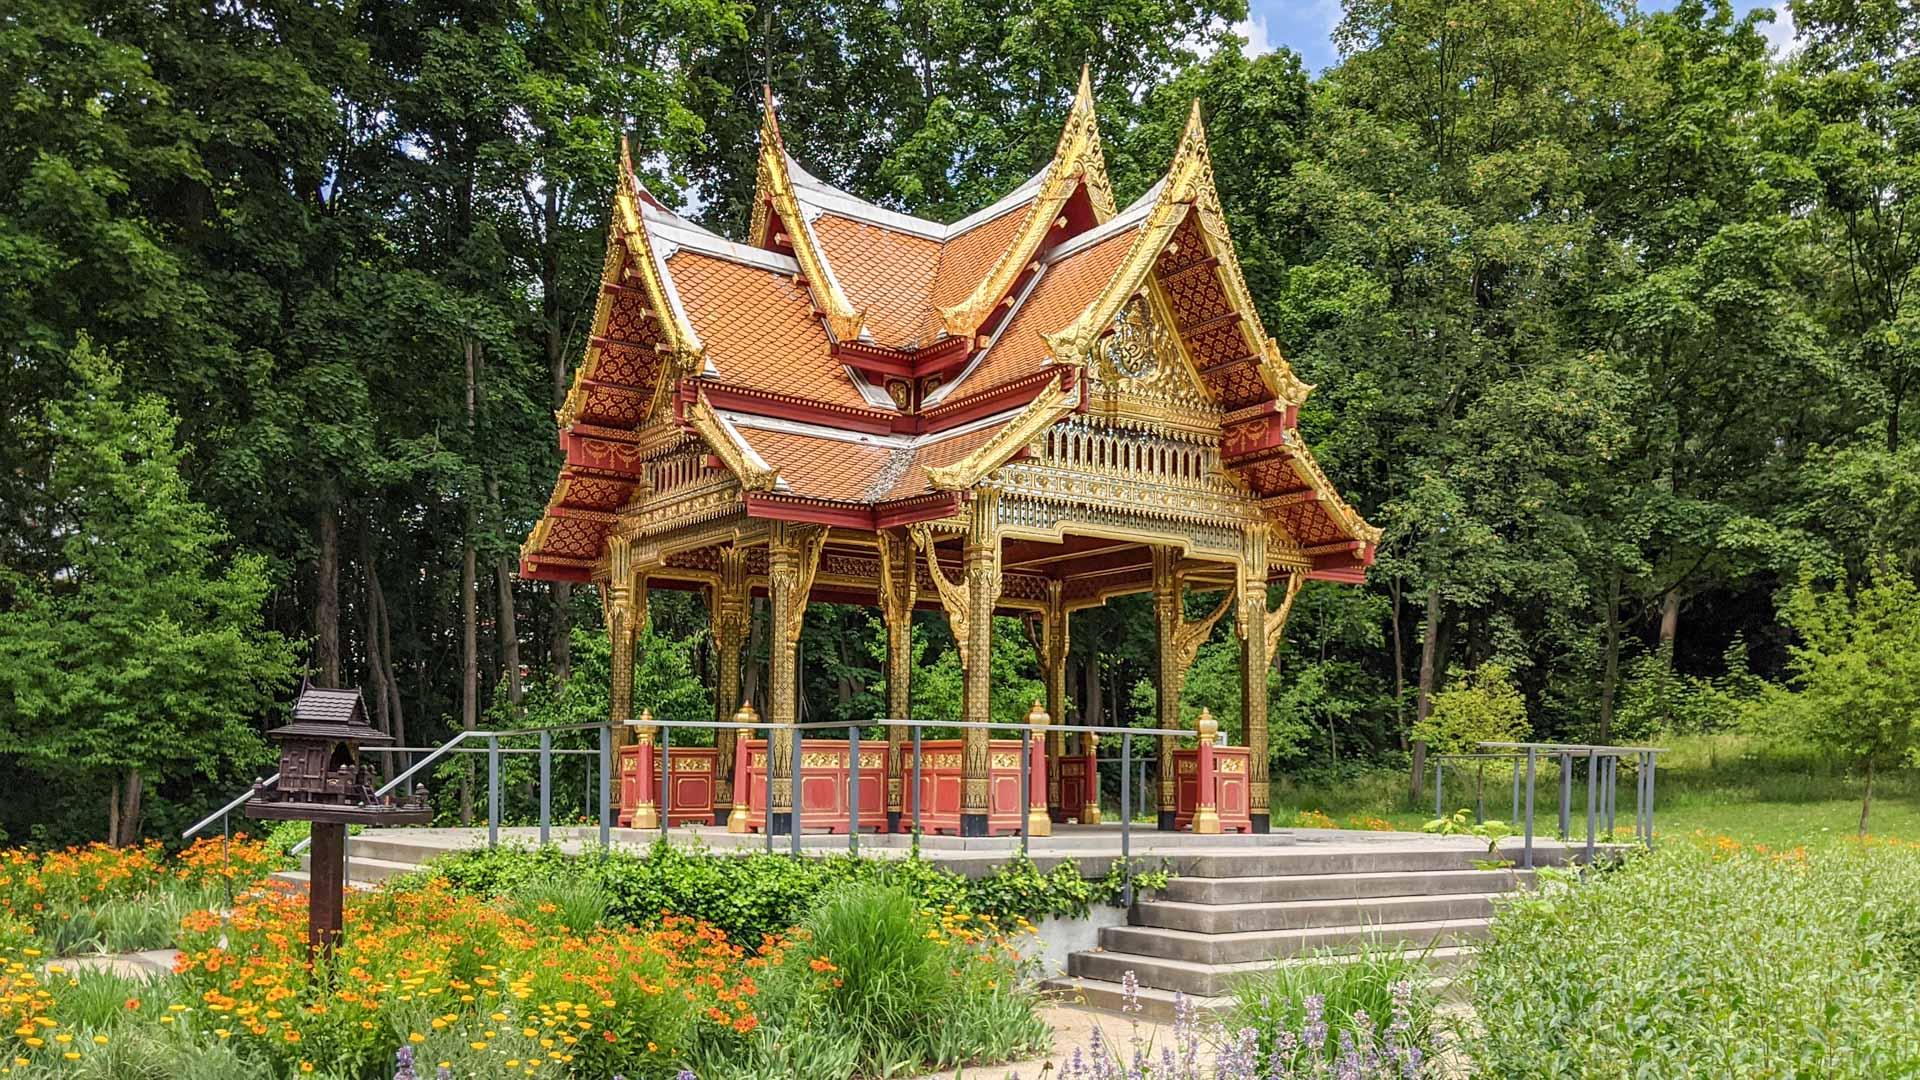 The Thai Sala in the Kurpark